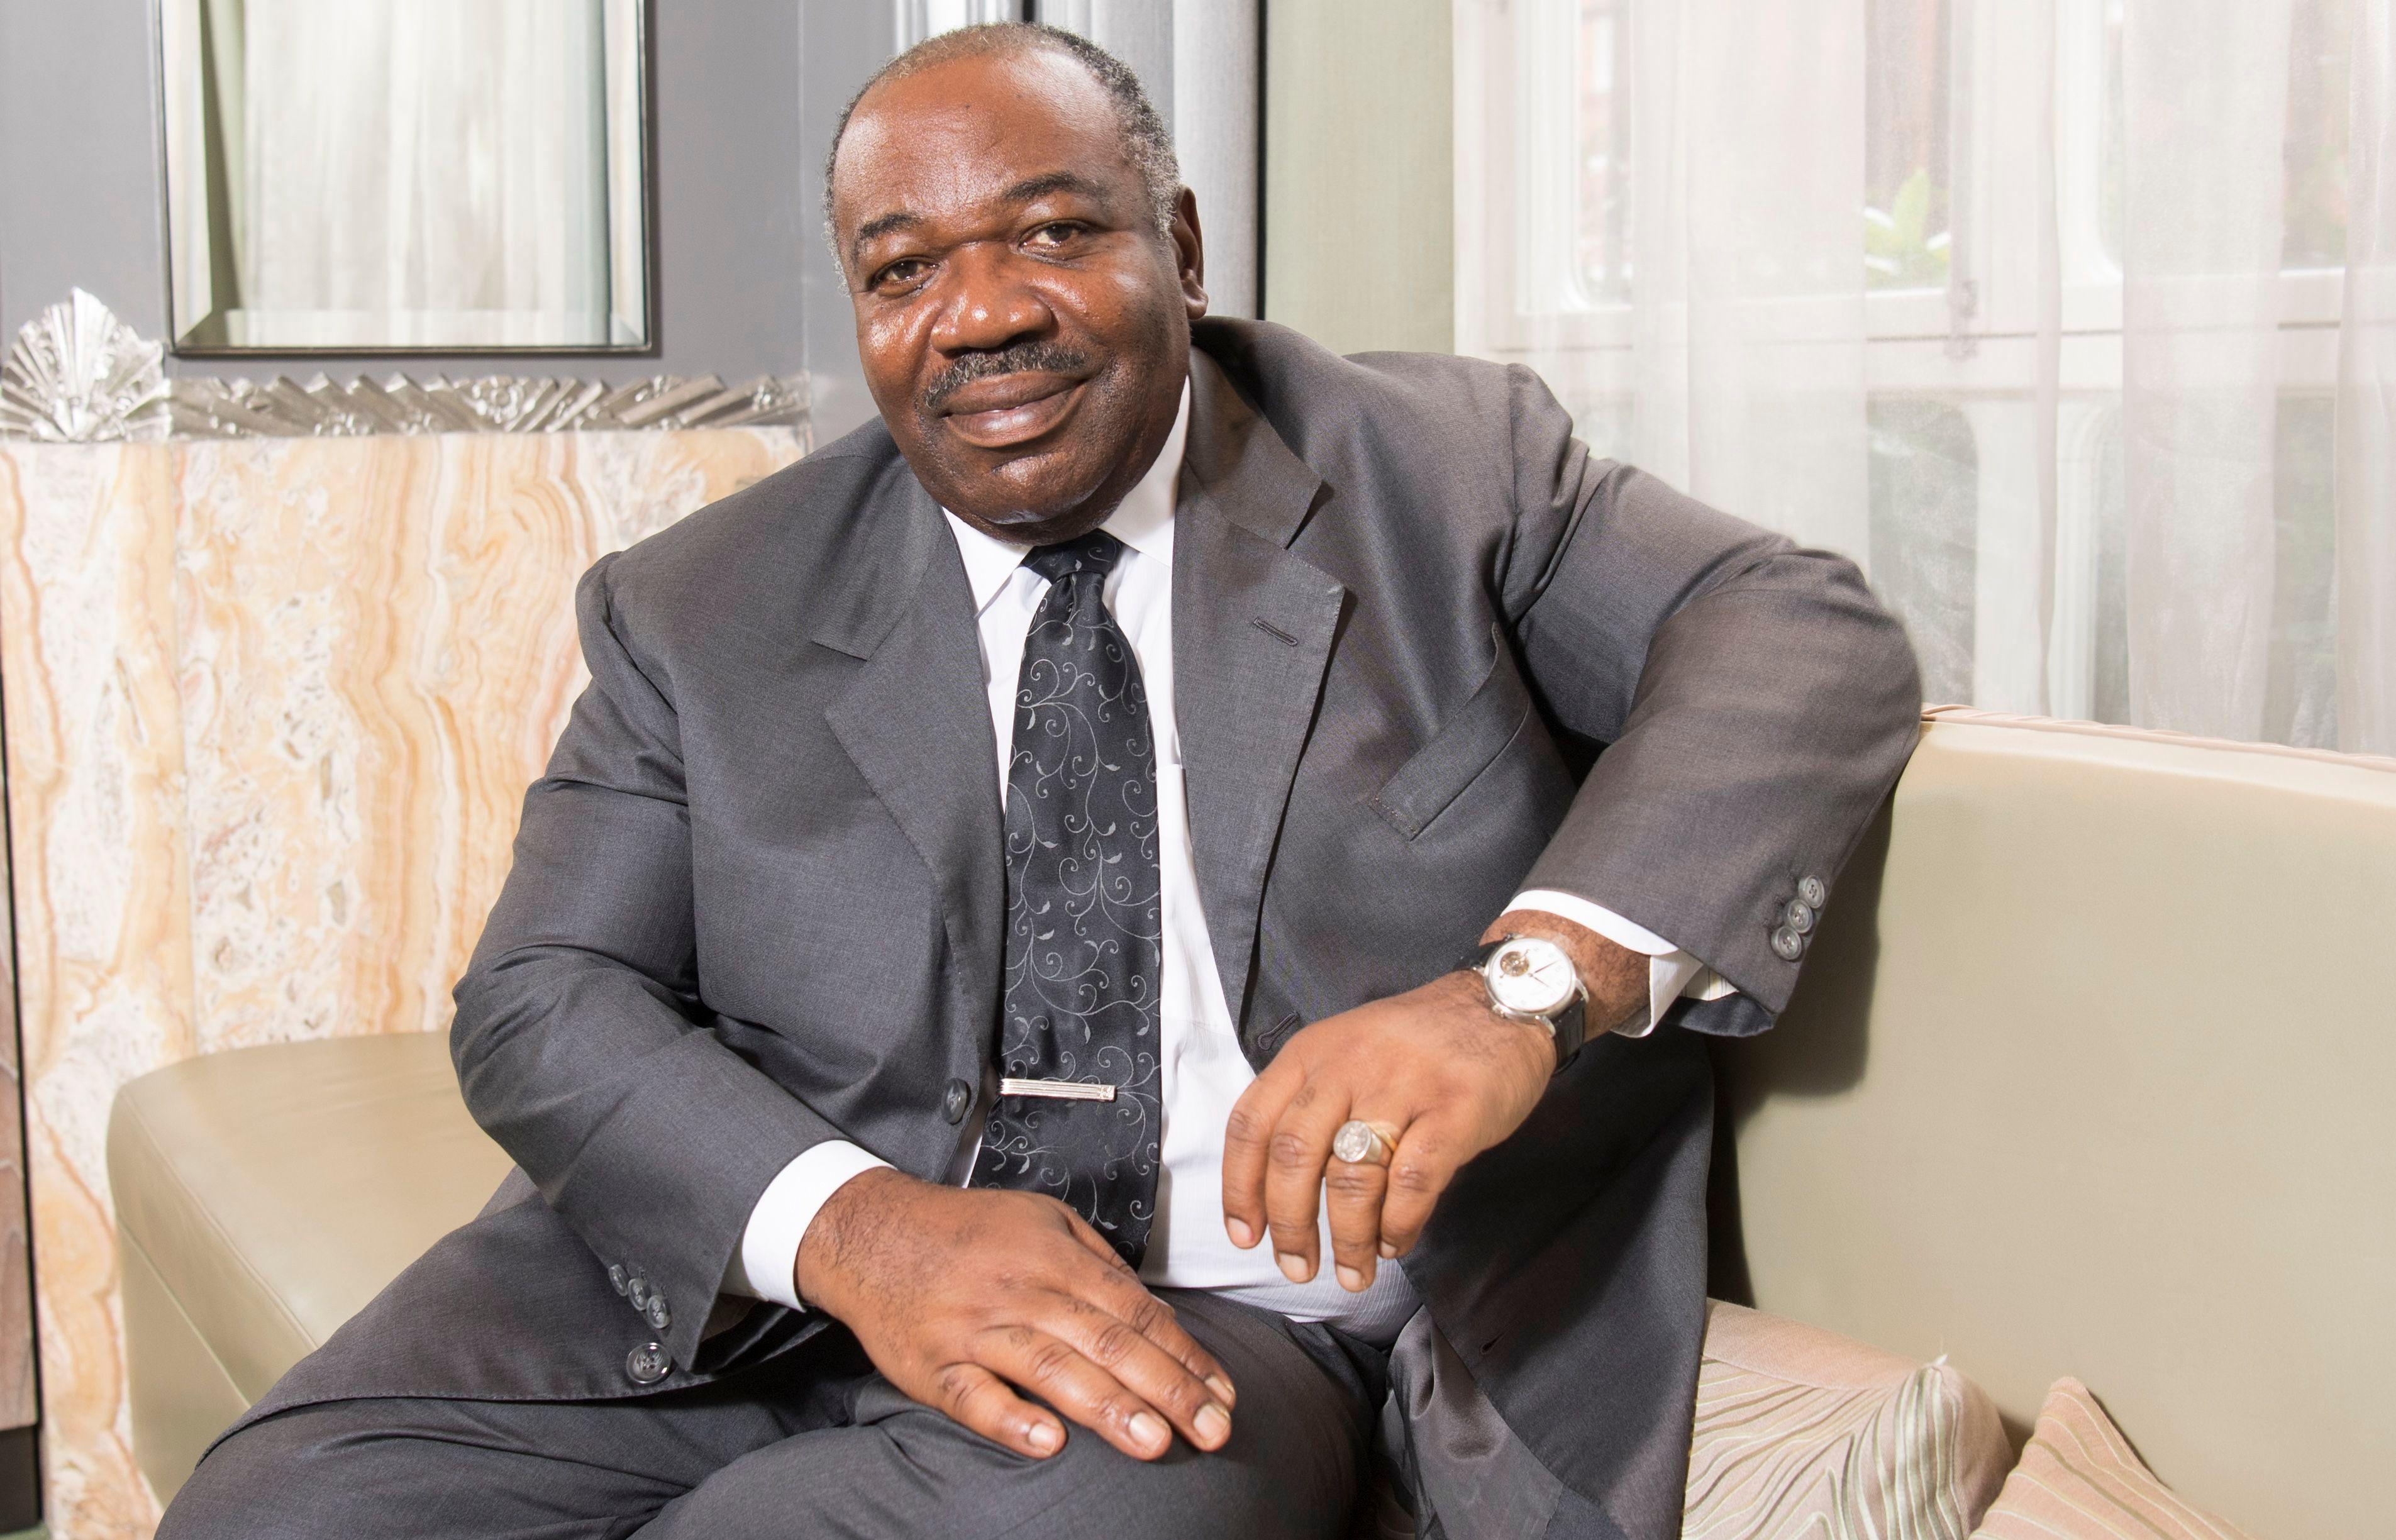 President of Gabon Ali Bongo Ondimba President of Gabon Ali Bongo Ondimba,London,UK, October 8, 2018.[Photo via IC/Paul Grover]